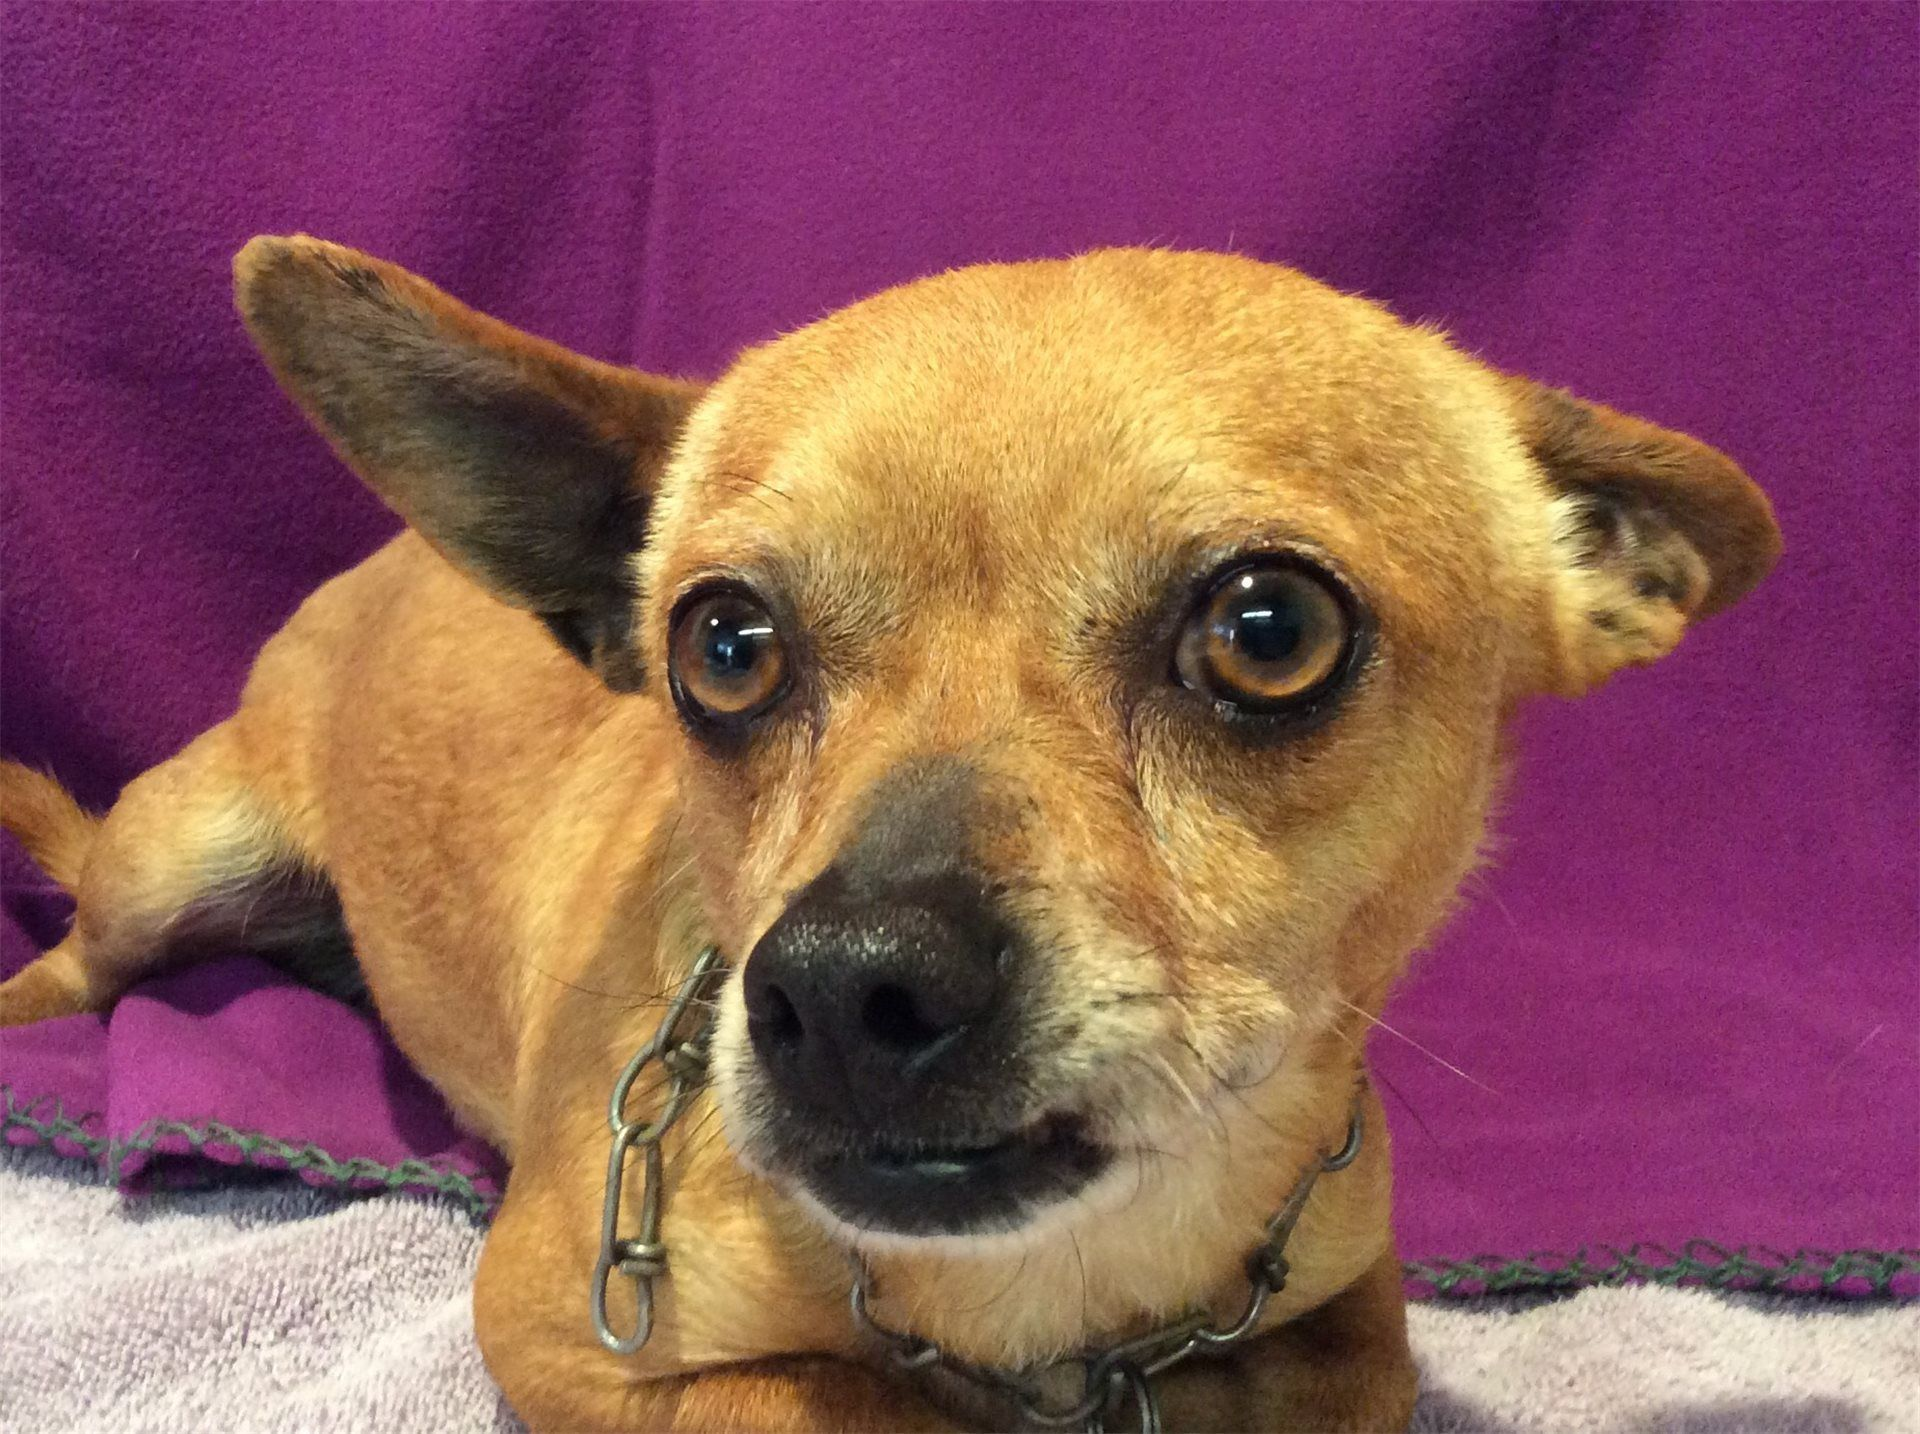 Inland Valley Humane Society Dog adoption, Humane